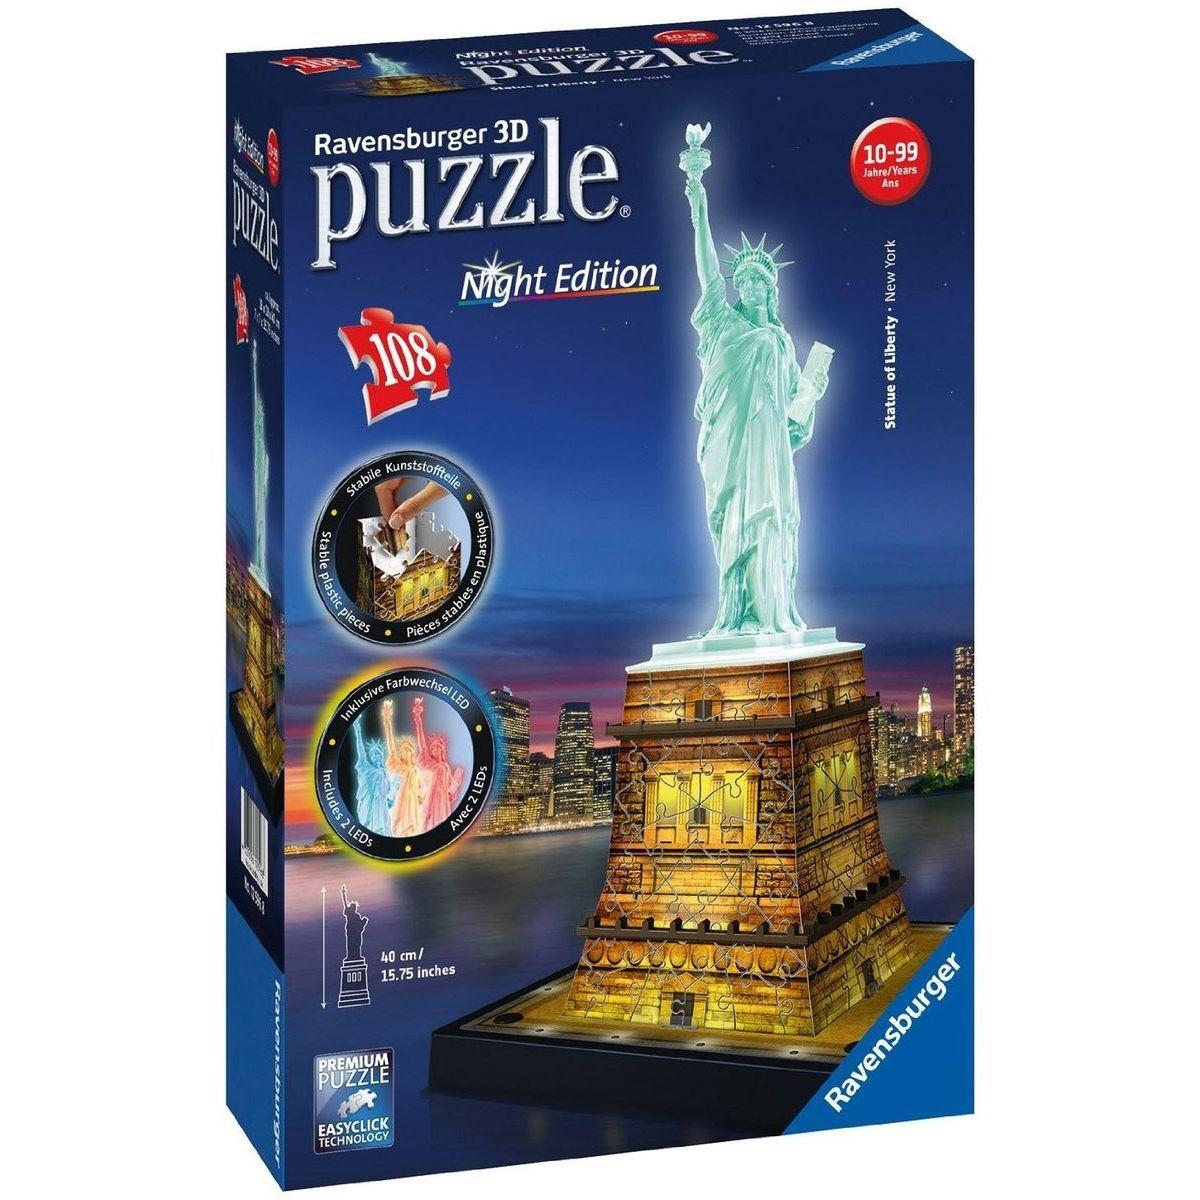 Ravensburger 3D Puzzle svietiace Socha Slobody 108 dielikov